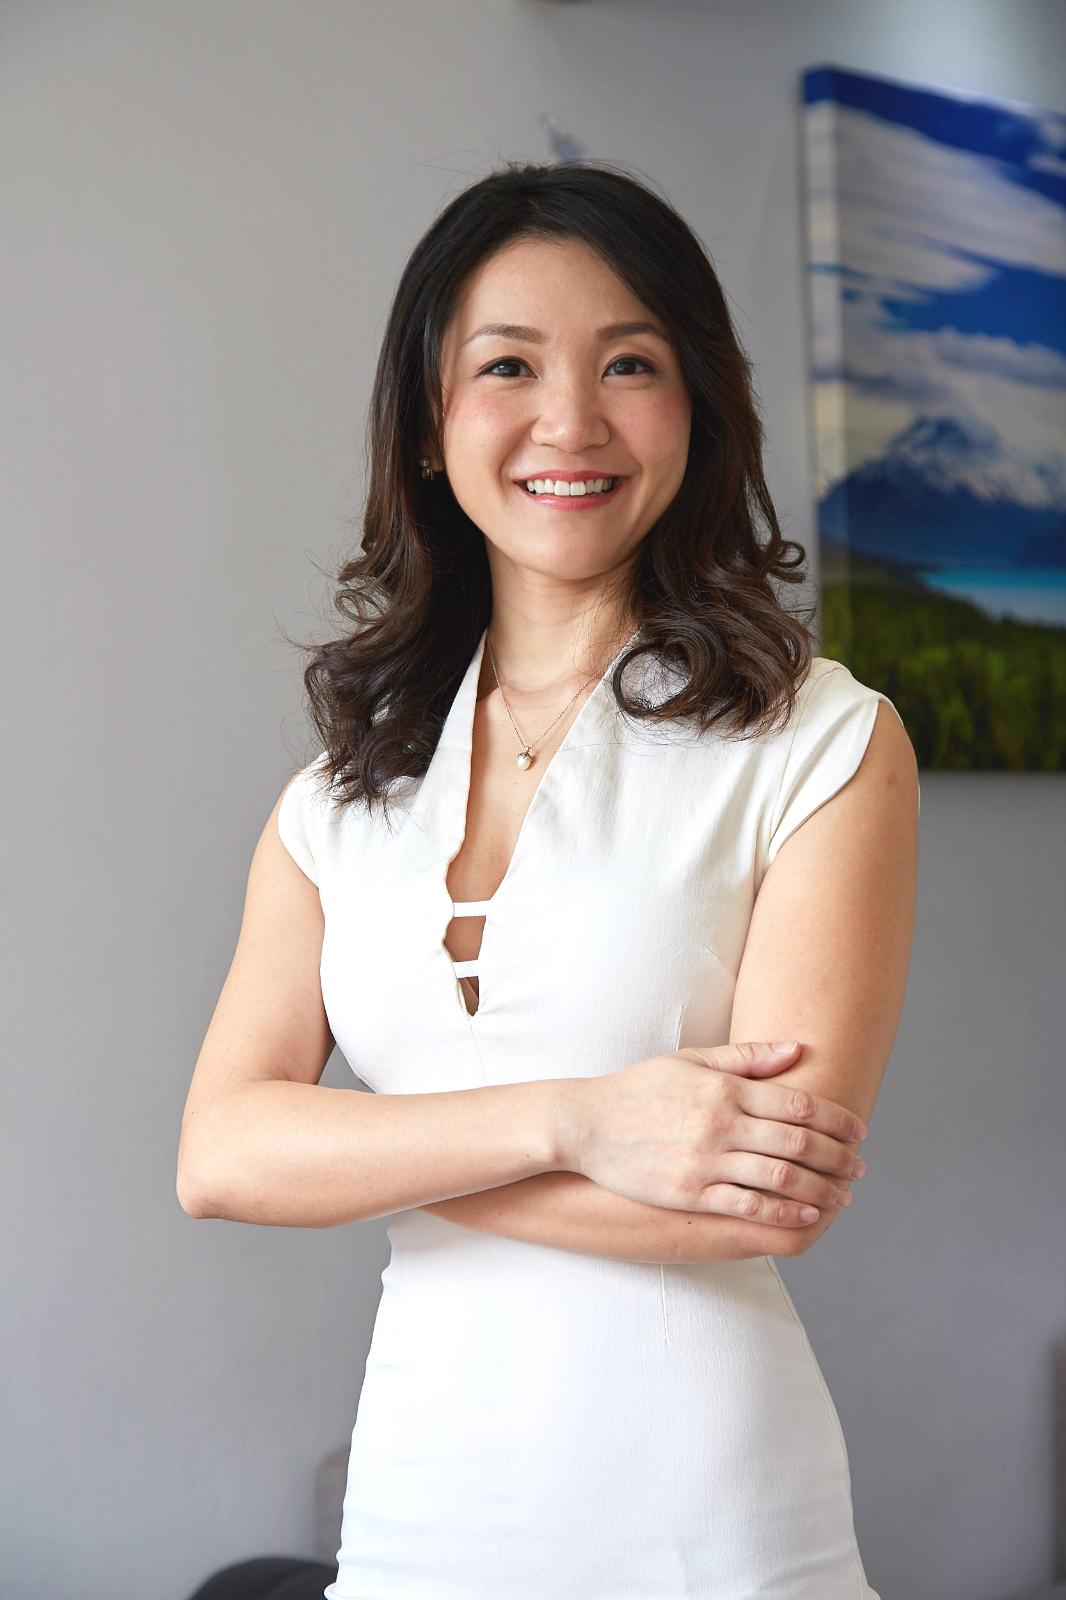 Singapore U.S. Dentist Dr Yao Xu